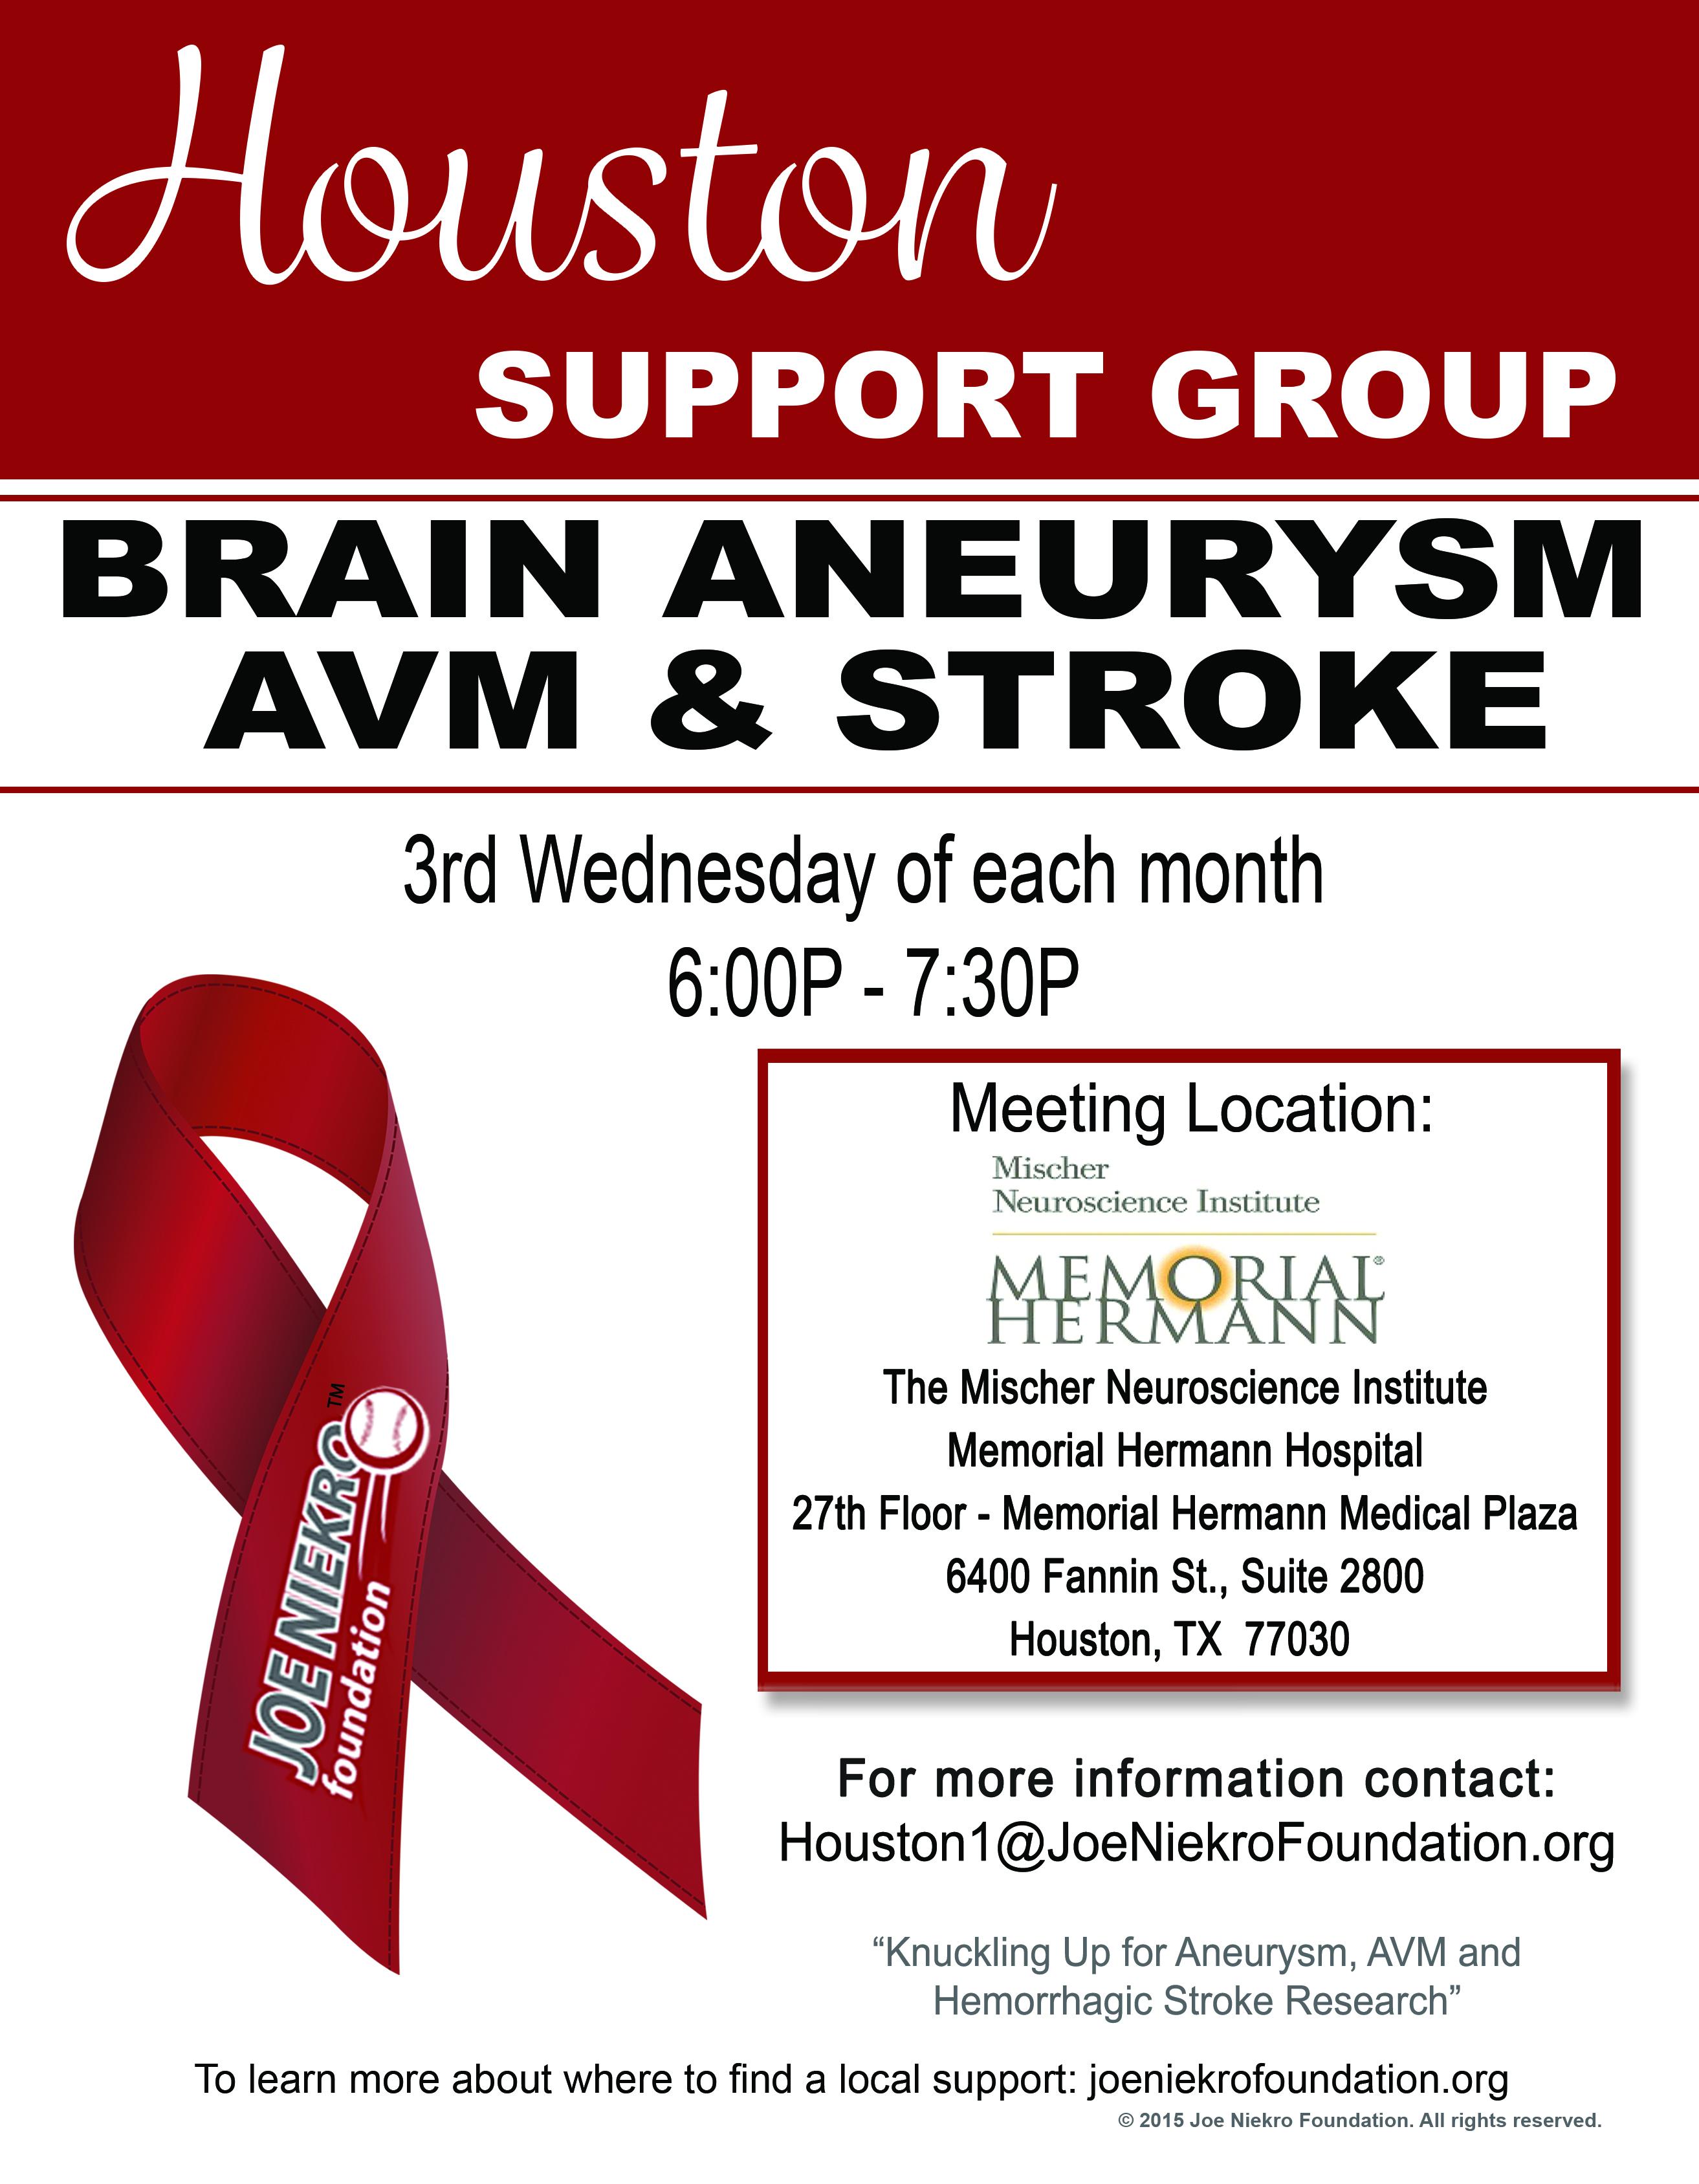 http://www.joeniekrofoundation.com/patient-caregiver-support/support-groups/locations/attachment/memorial-hermann-poster/